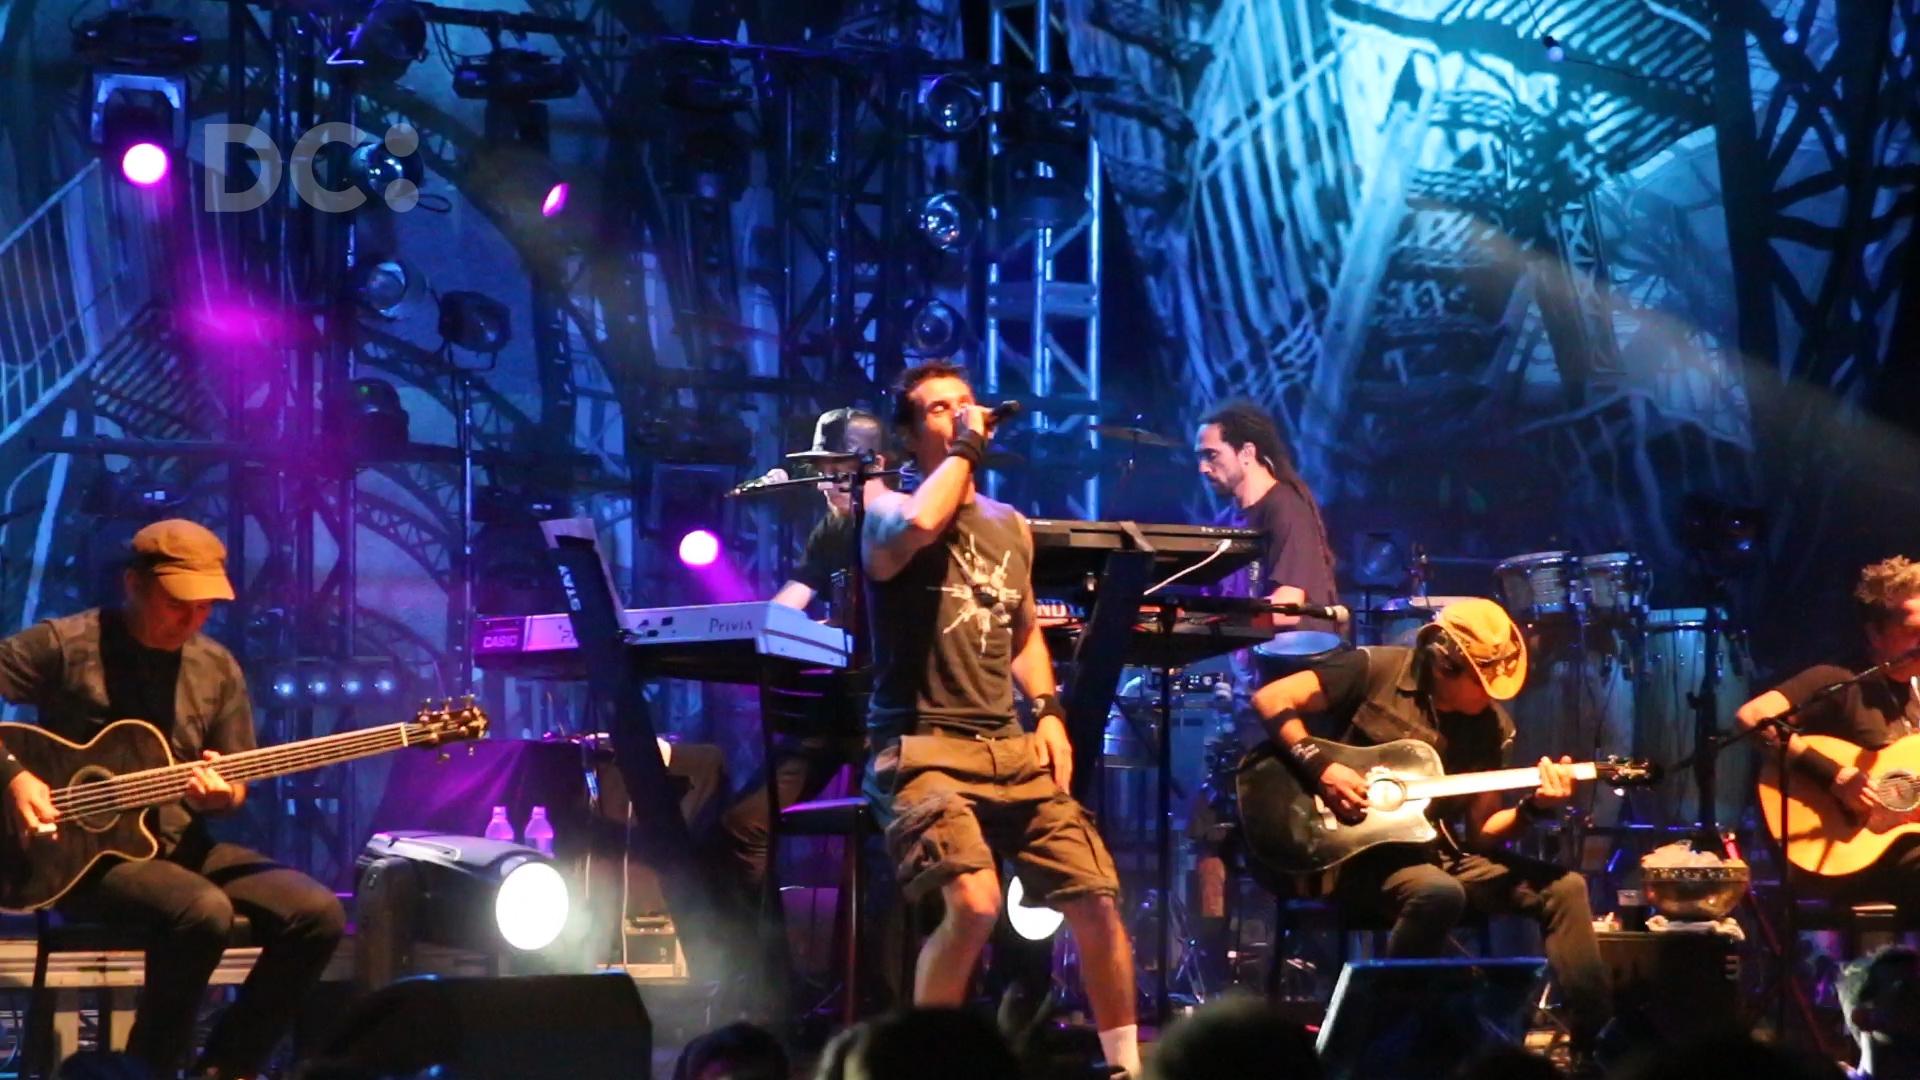 Baterista do Capital Inicial fala sobre o amor da banda por Floripa